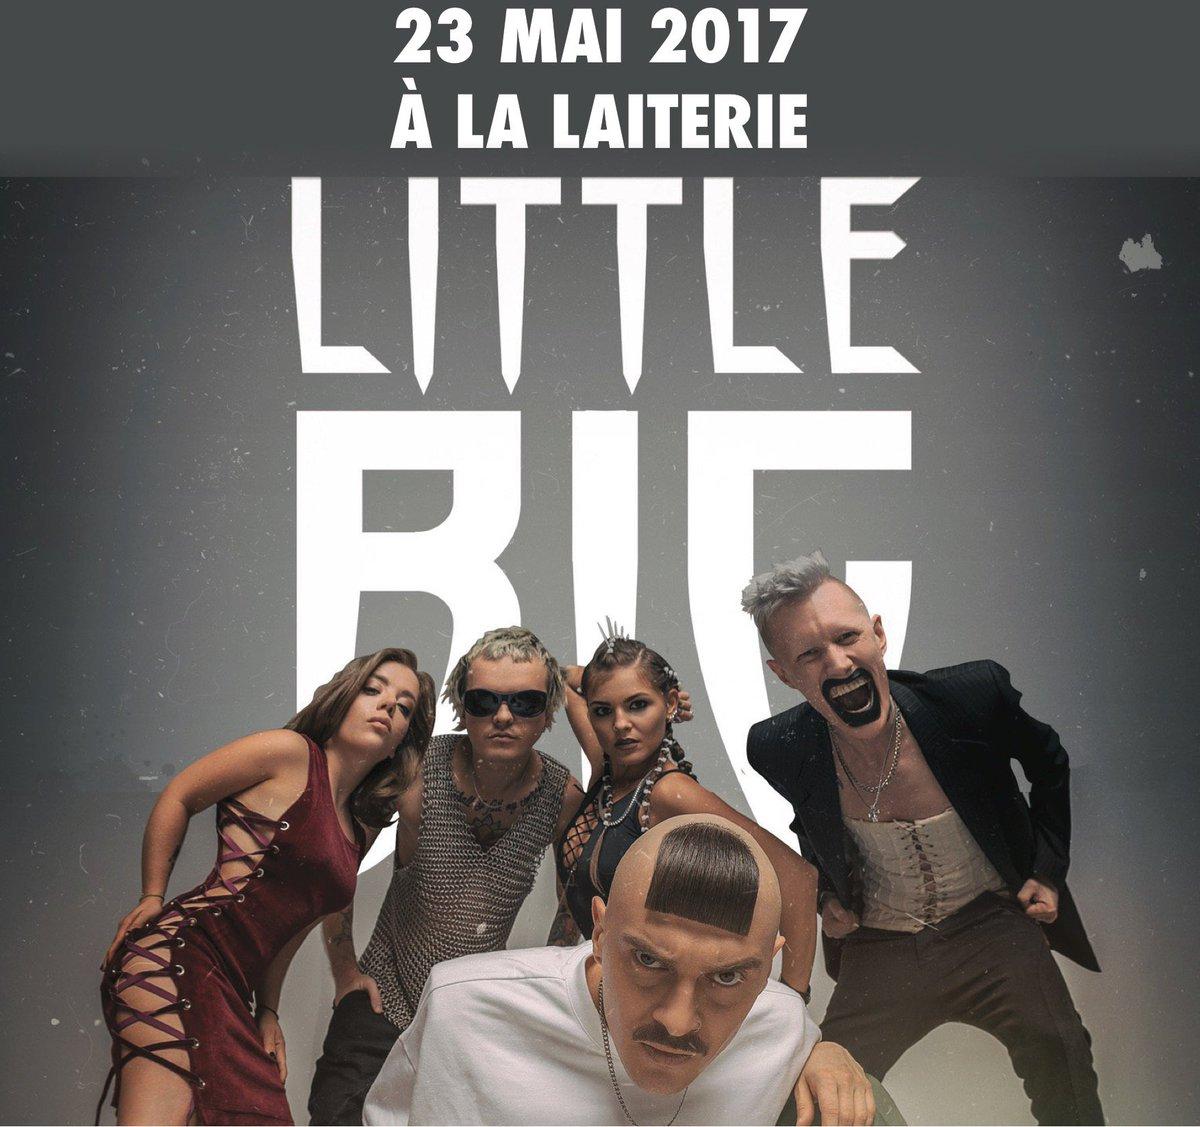 &gt; le 23 mai à La #laiterie #littlebig #electro #rave #hiphop #trash #strasbourg Infos  https:// goo.gl/v2Au3o  &nbsp;  <br>http://pic.twitter.com/MohV9KMdHS